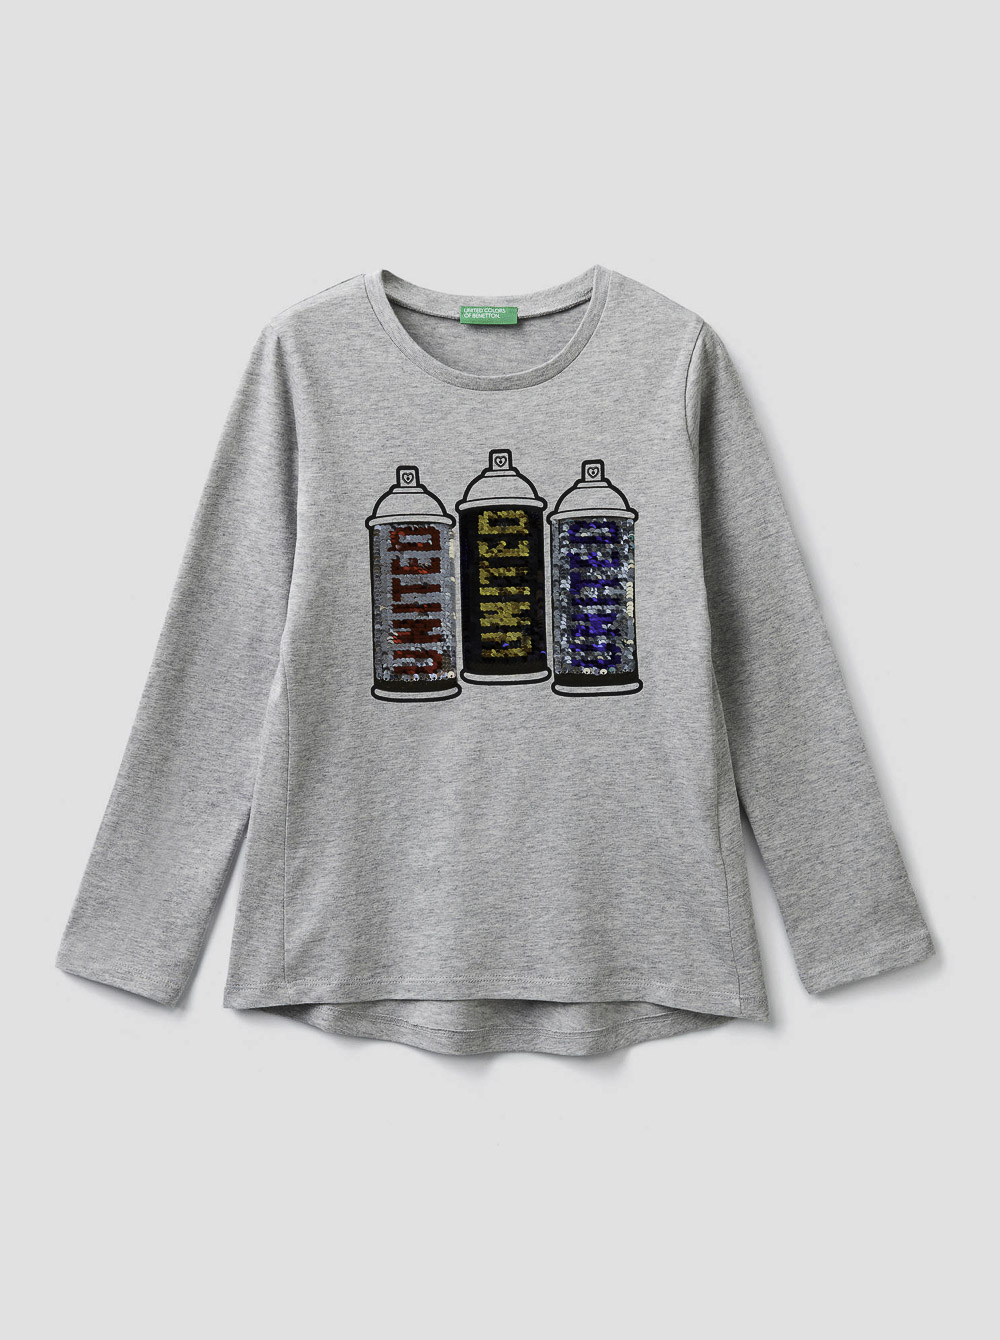 012 BENETTON T-shirt με παγέτες δύο όψεων 3096C14Q7 20A501